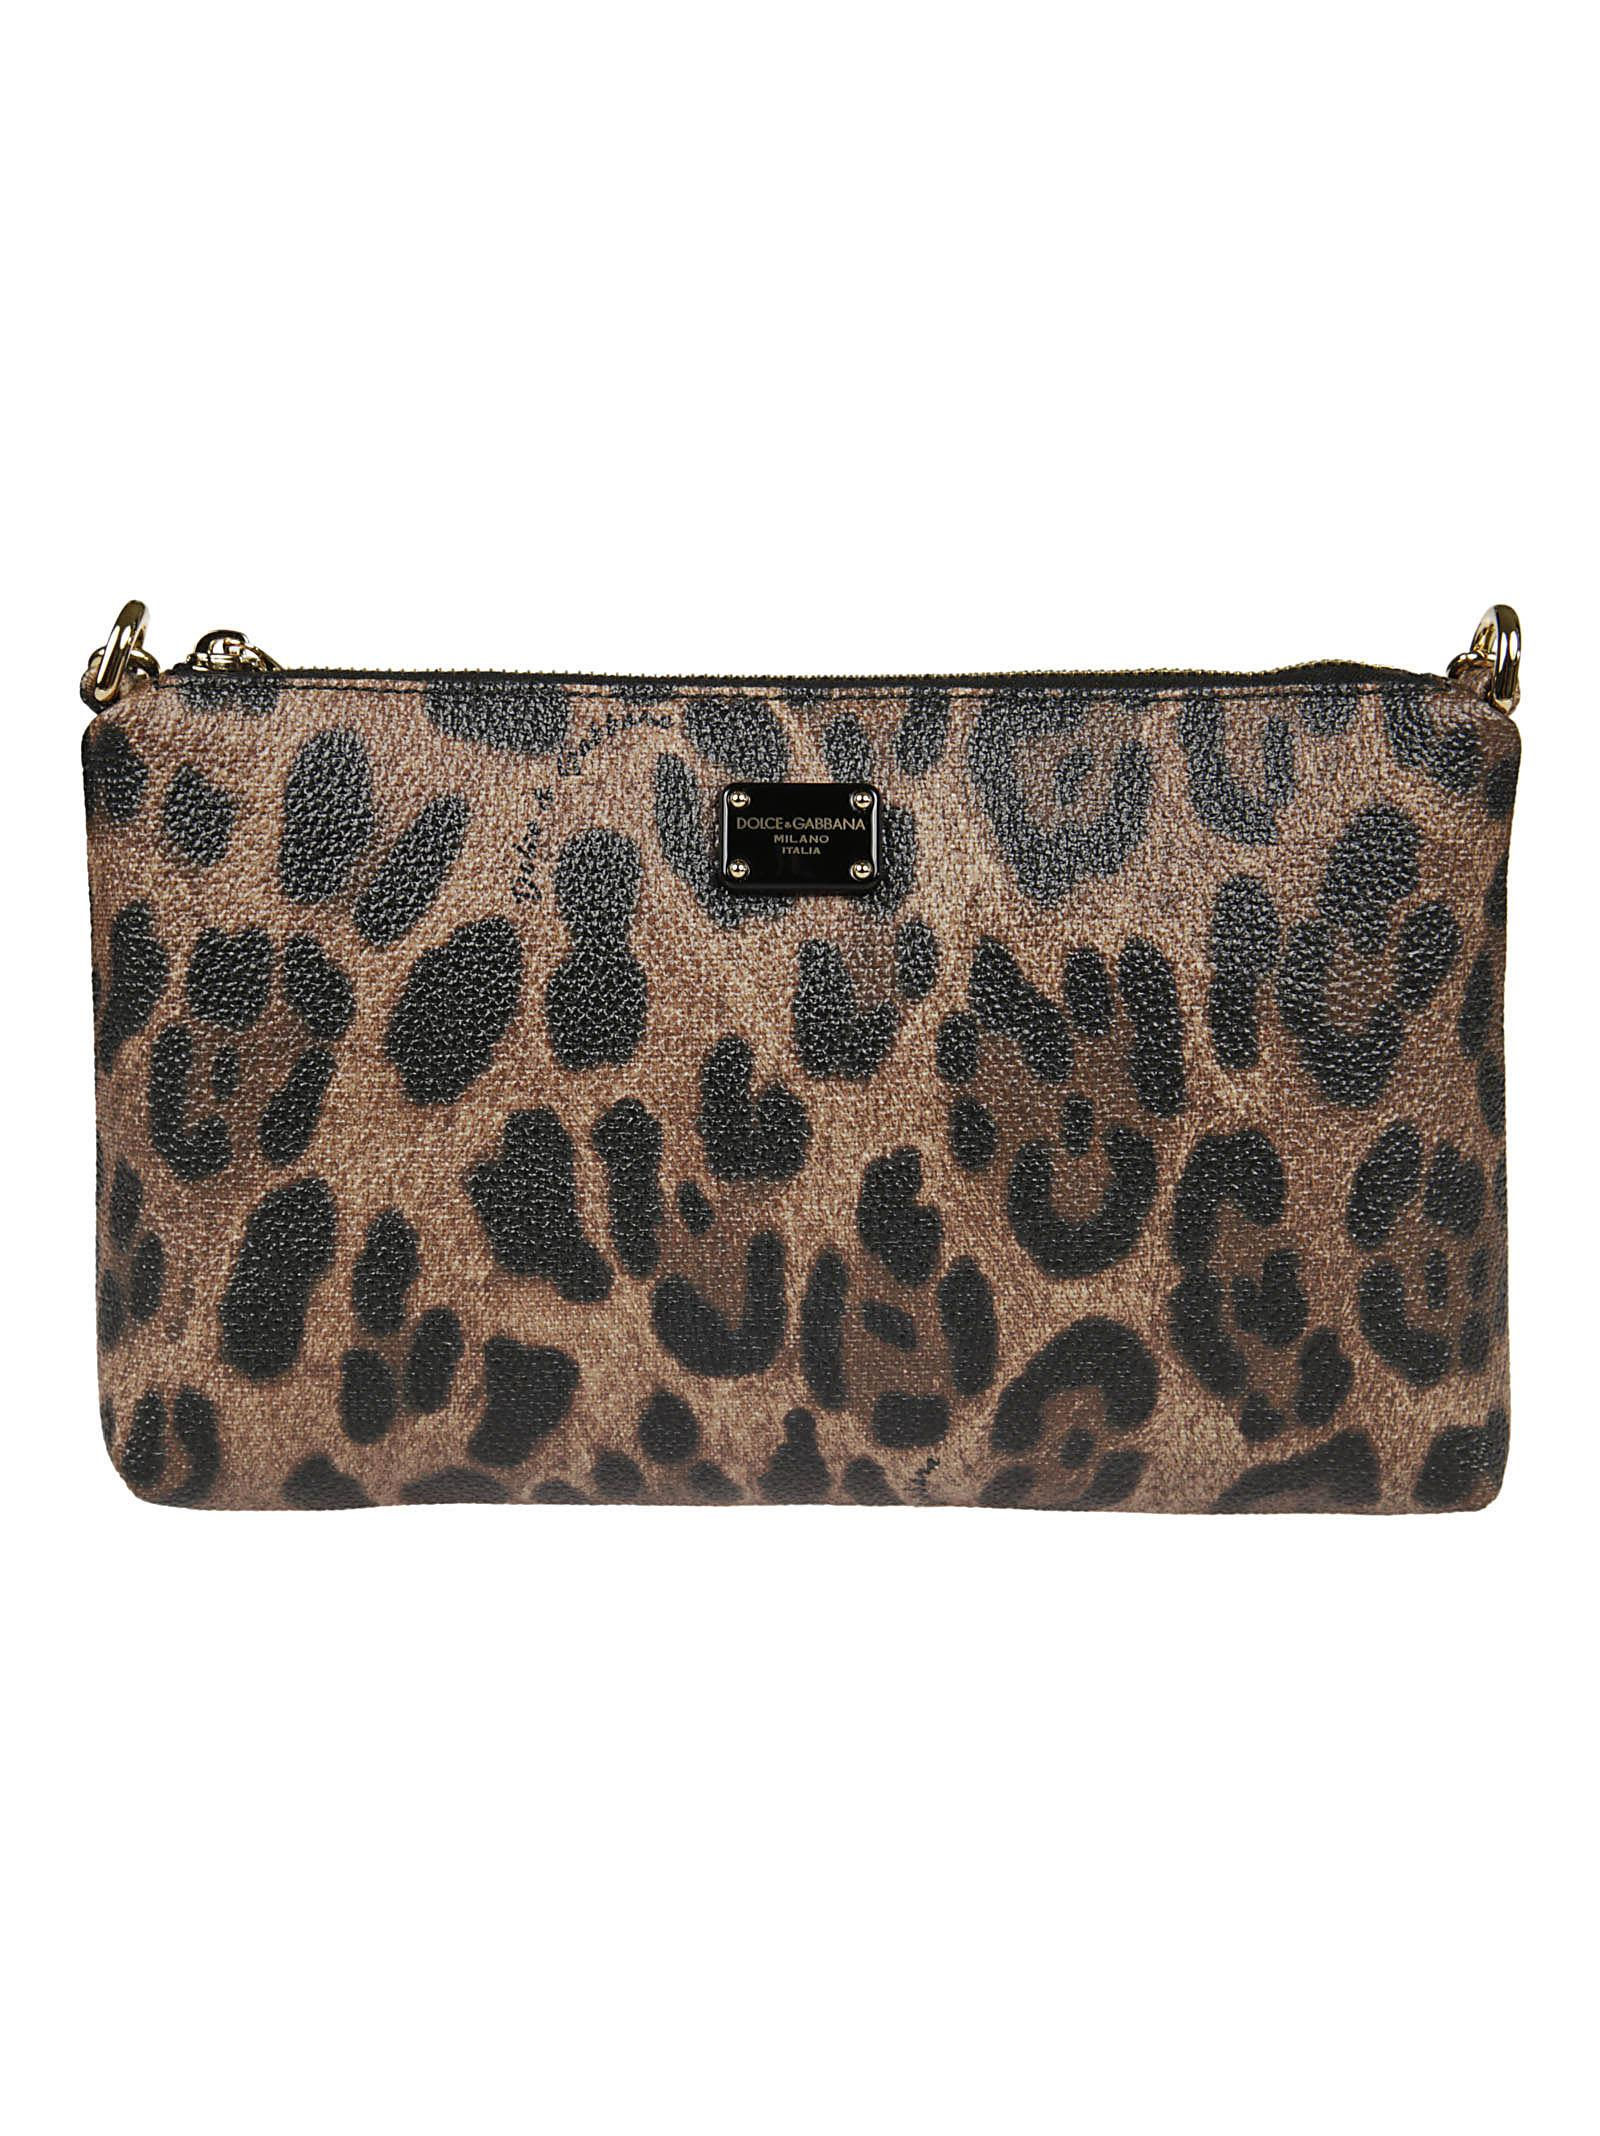 Dolce & Gabbana Mini Faux Leo Shoulder Bag